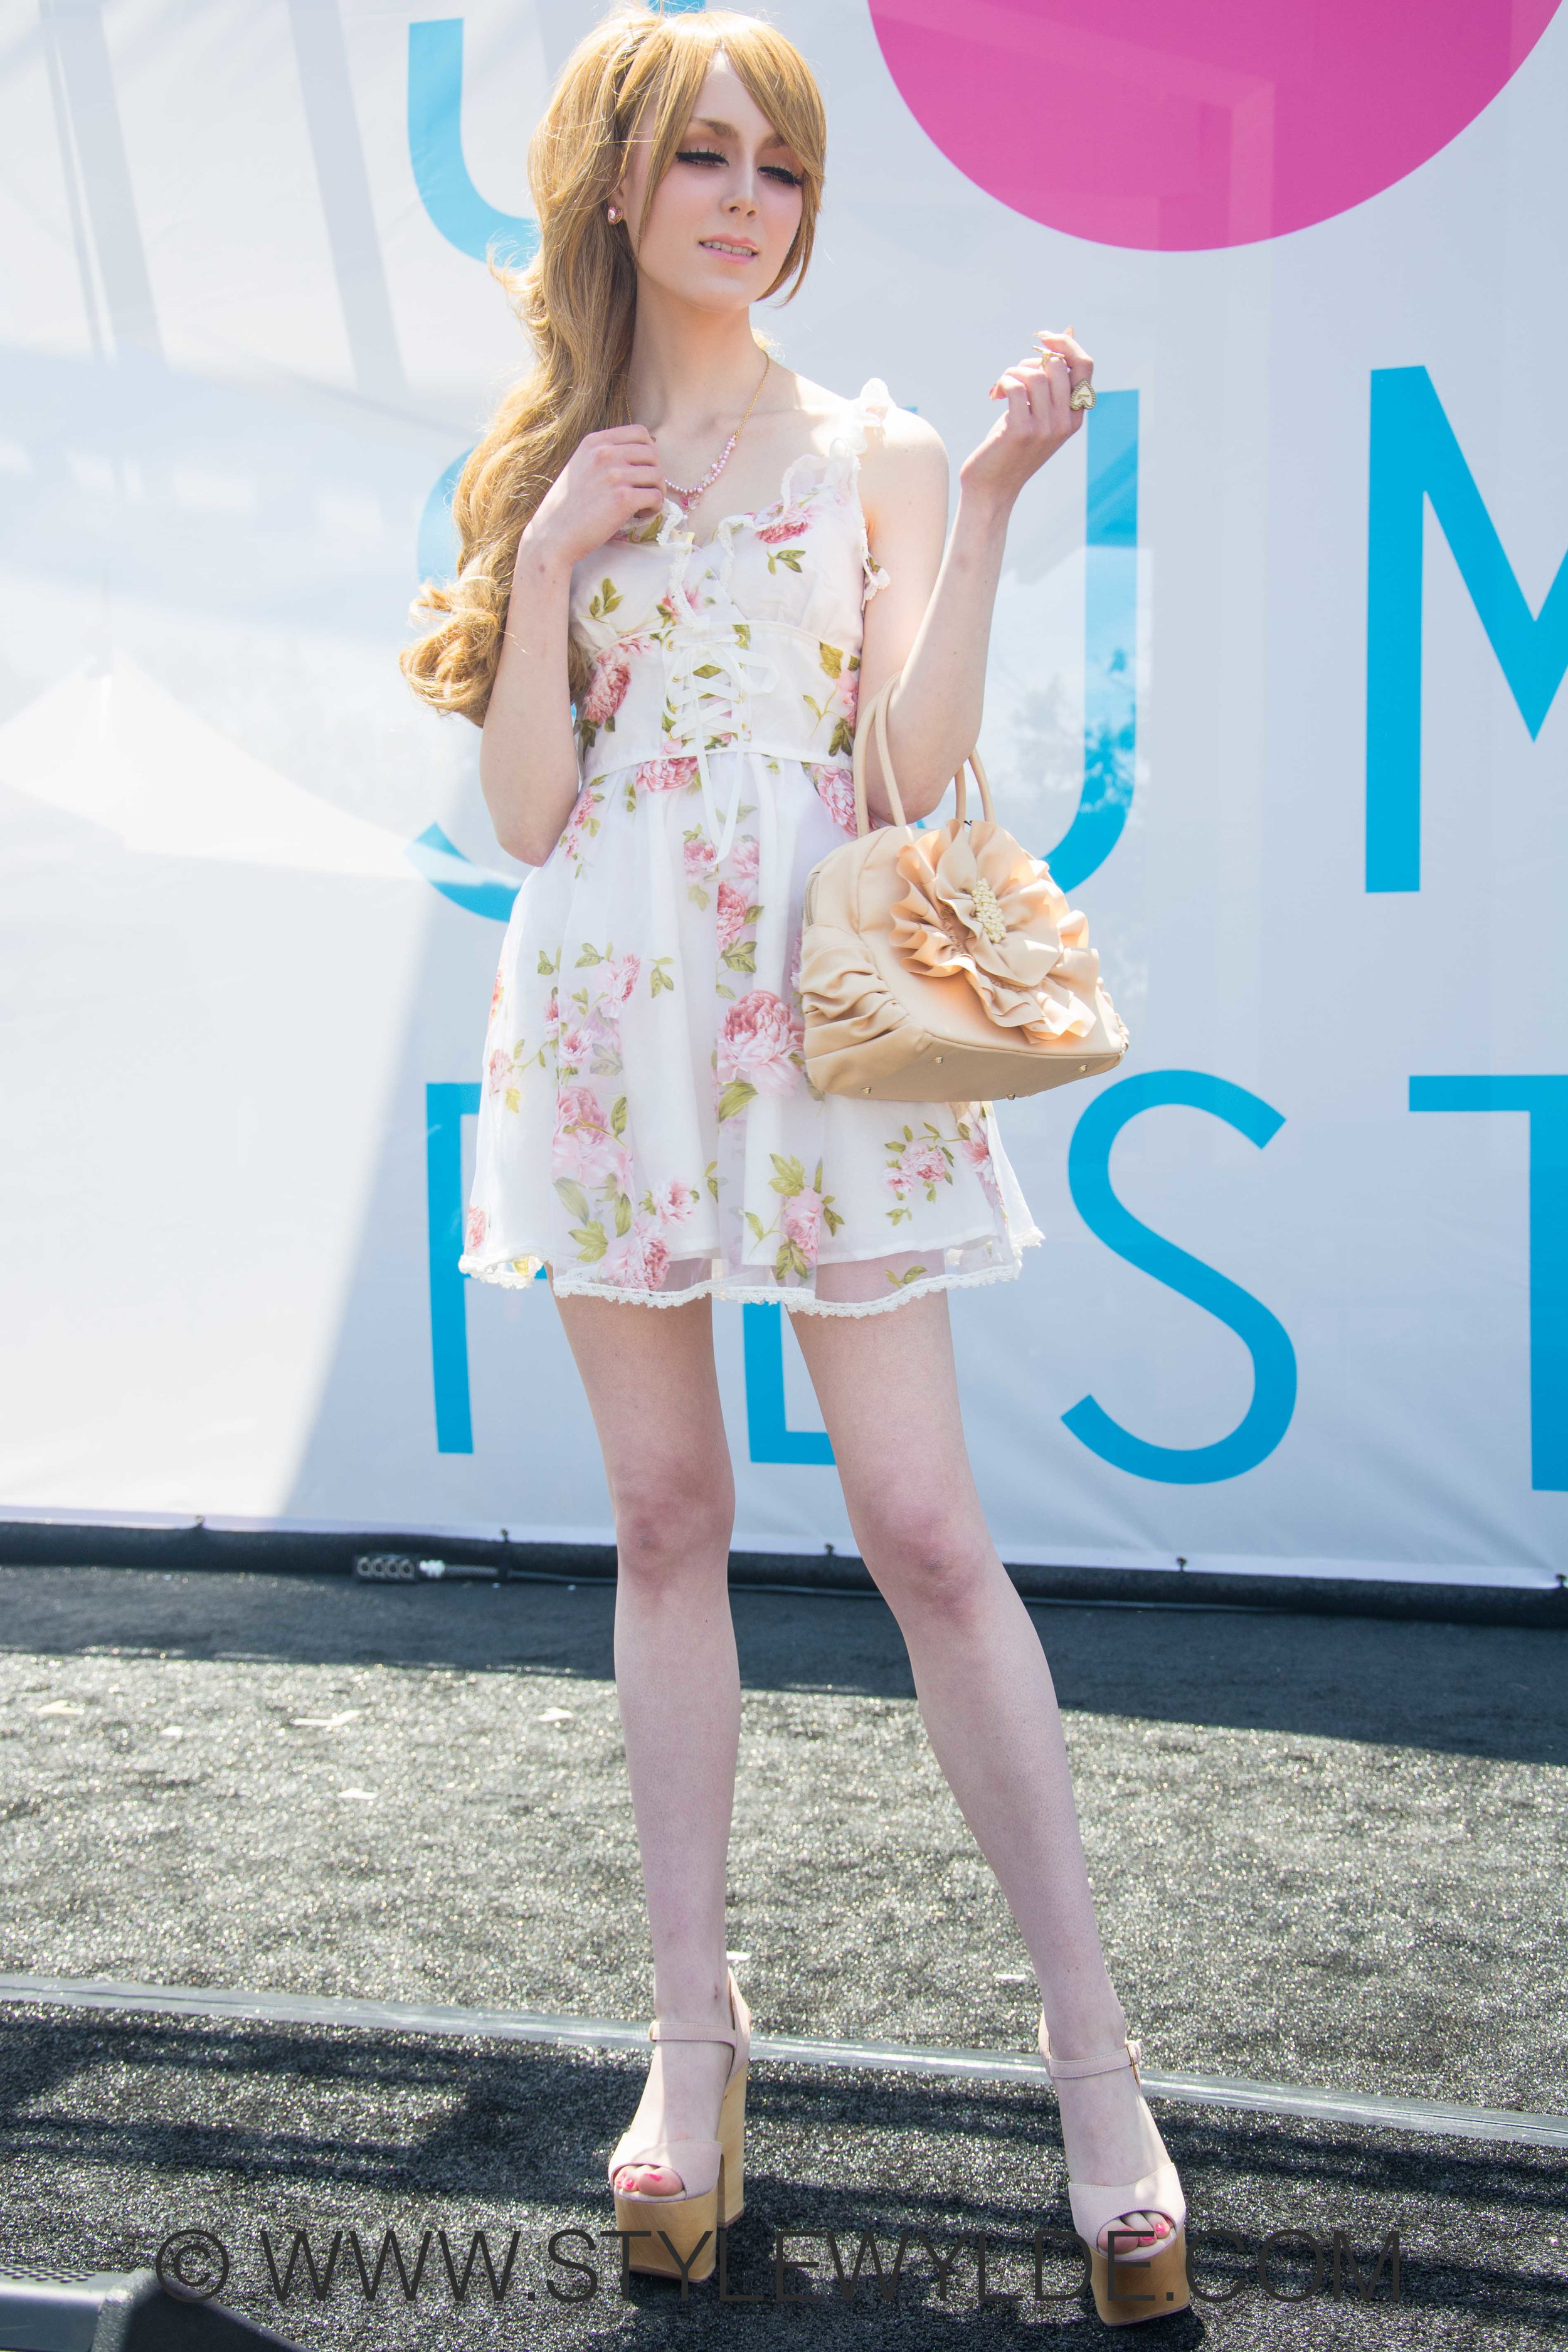 stylewylde_sw_jpop_2014_fashion_show-5.jpg